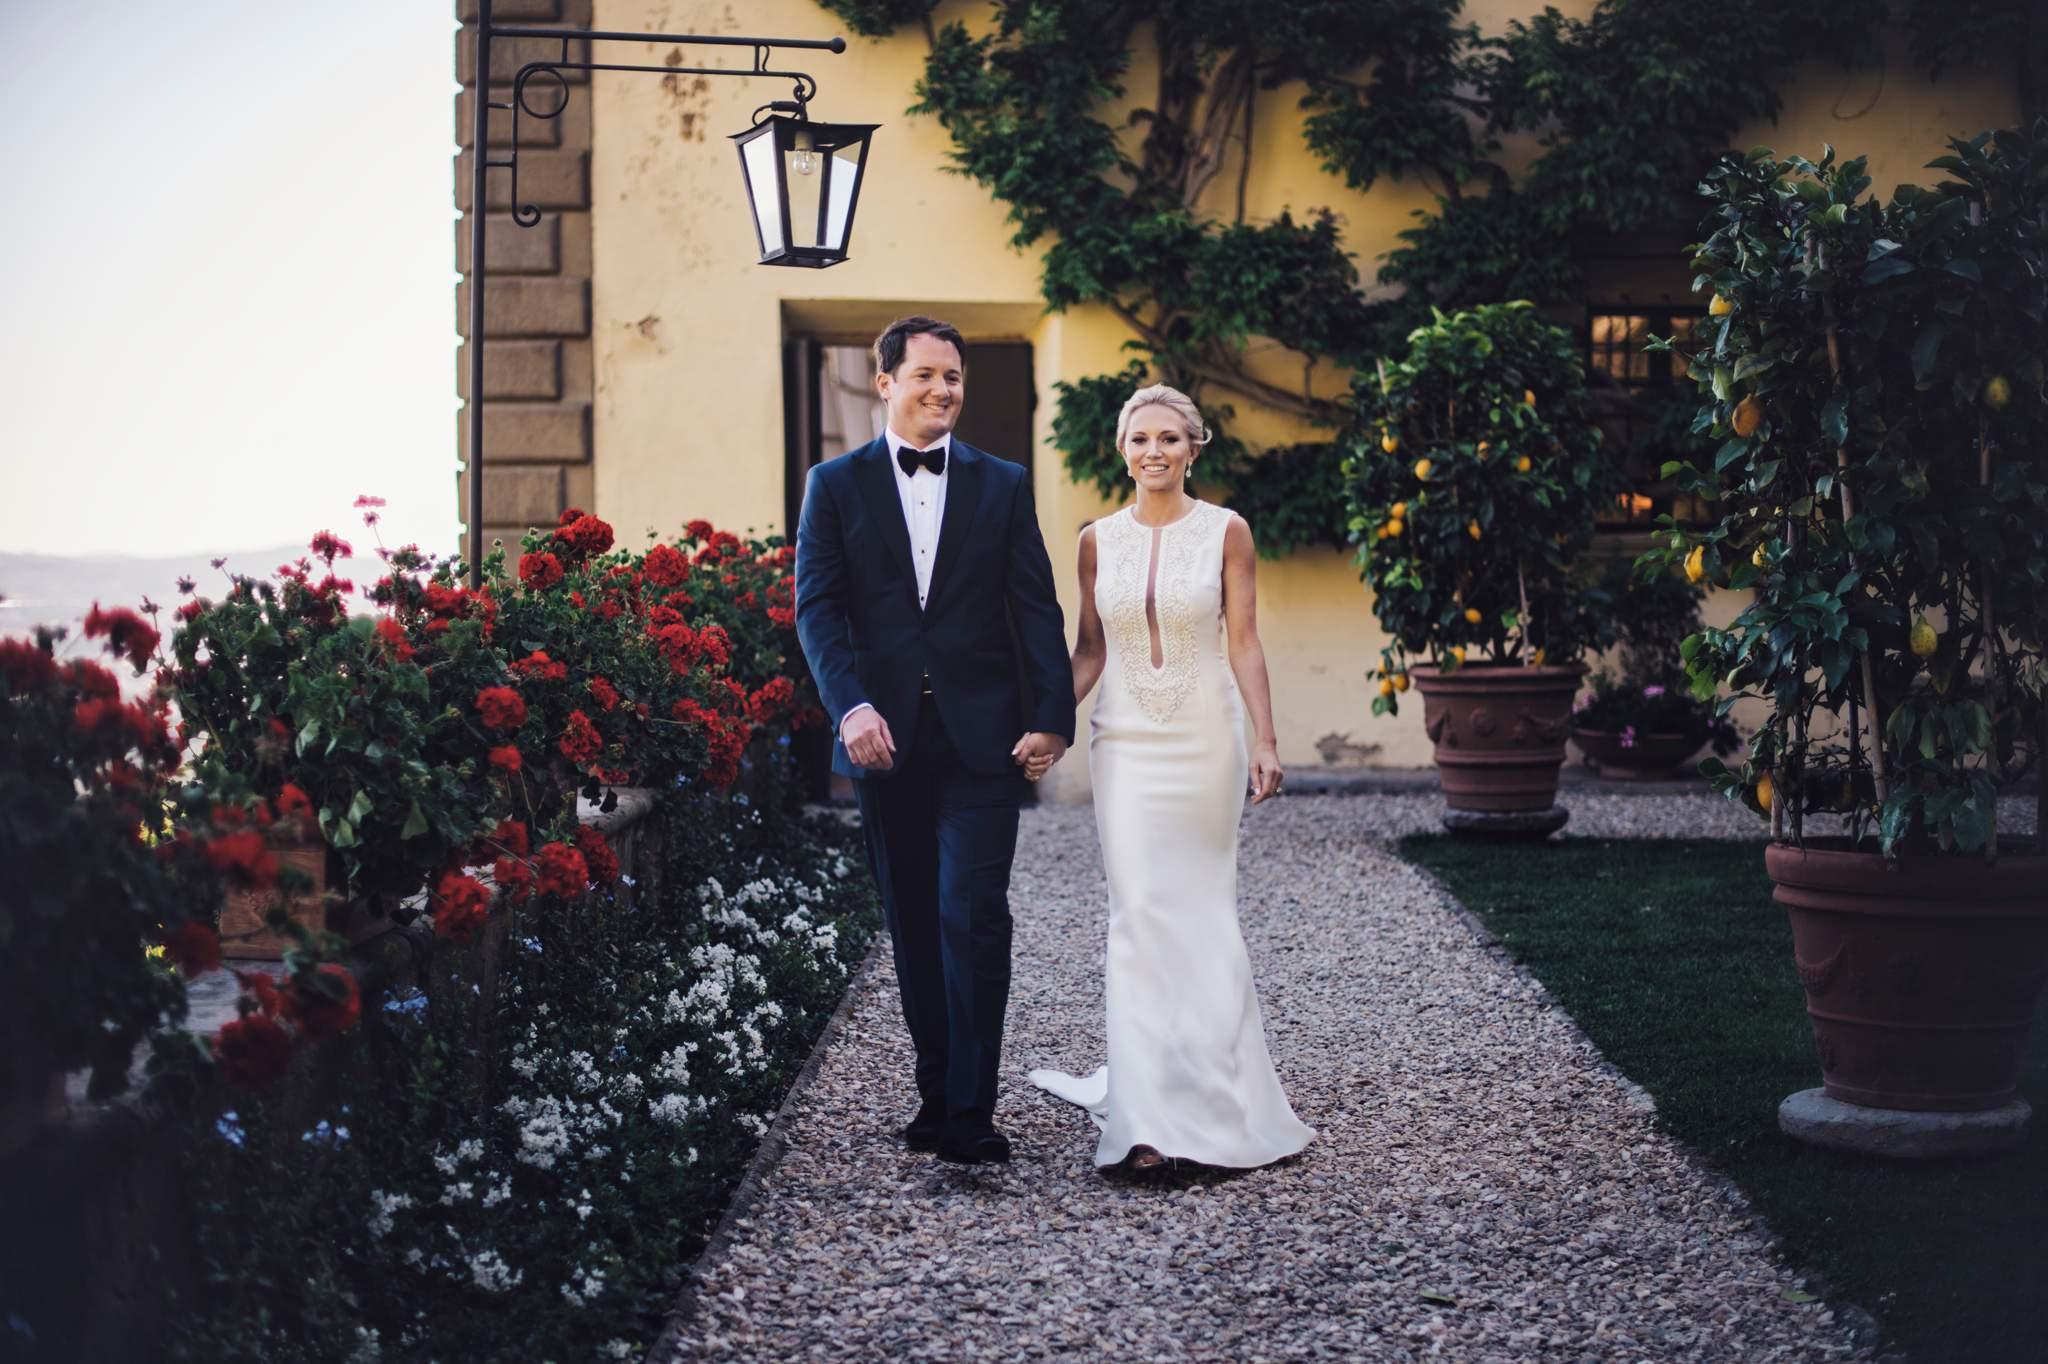 34wedding-photographer-belmond-san-michele-florence